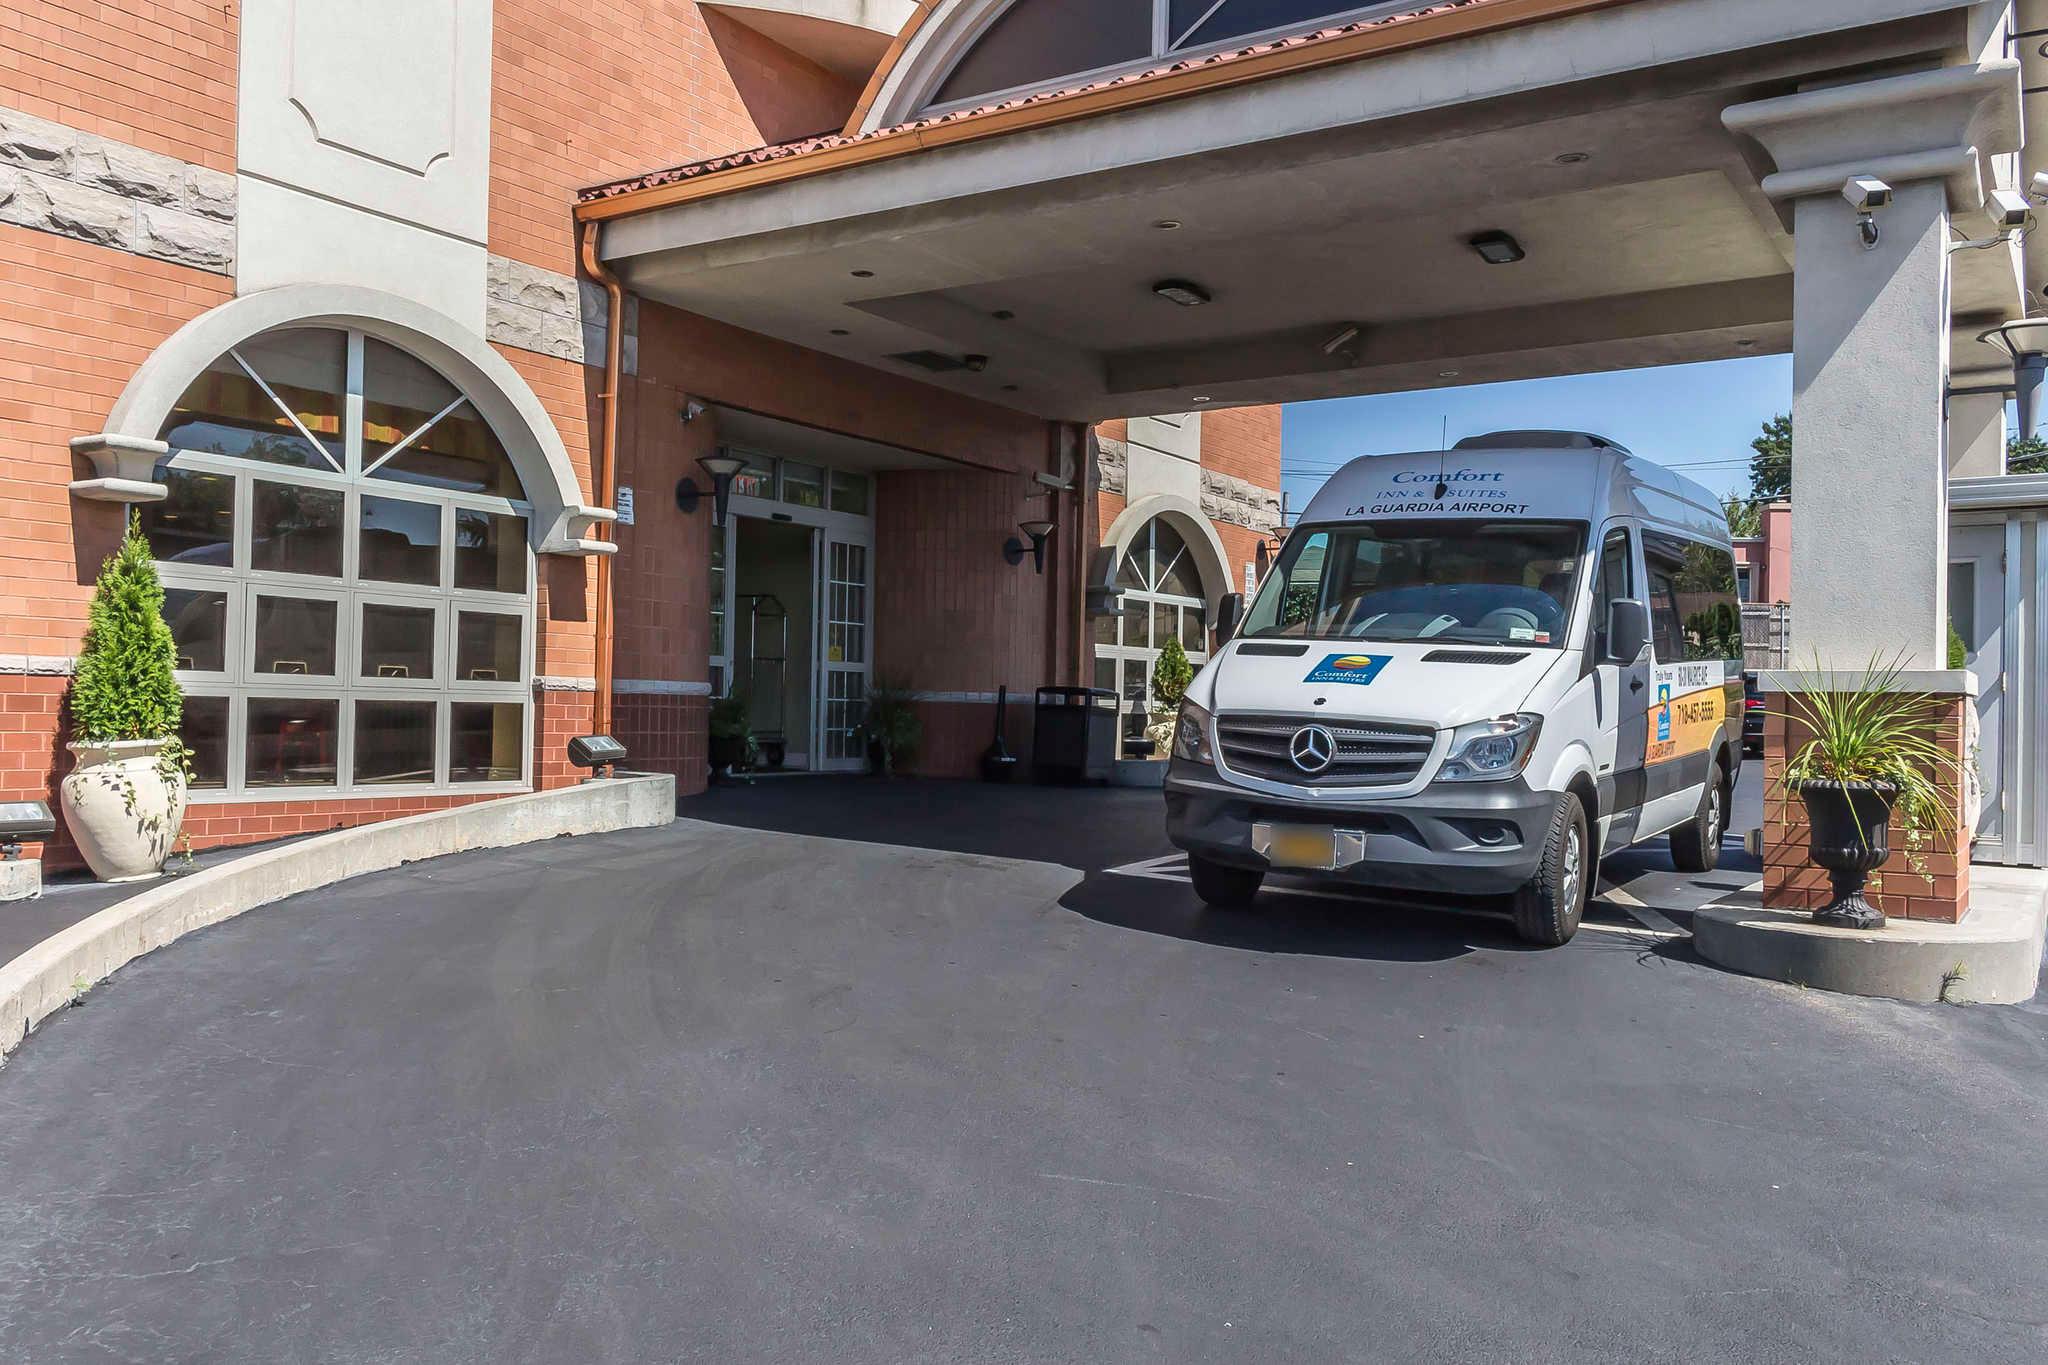 Comfort Inn & Suites LaGuardia Airport